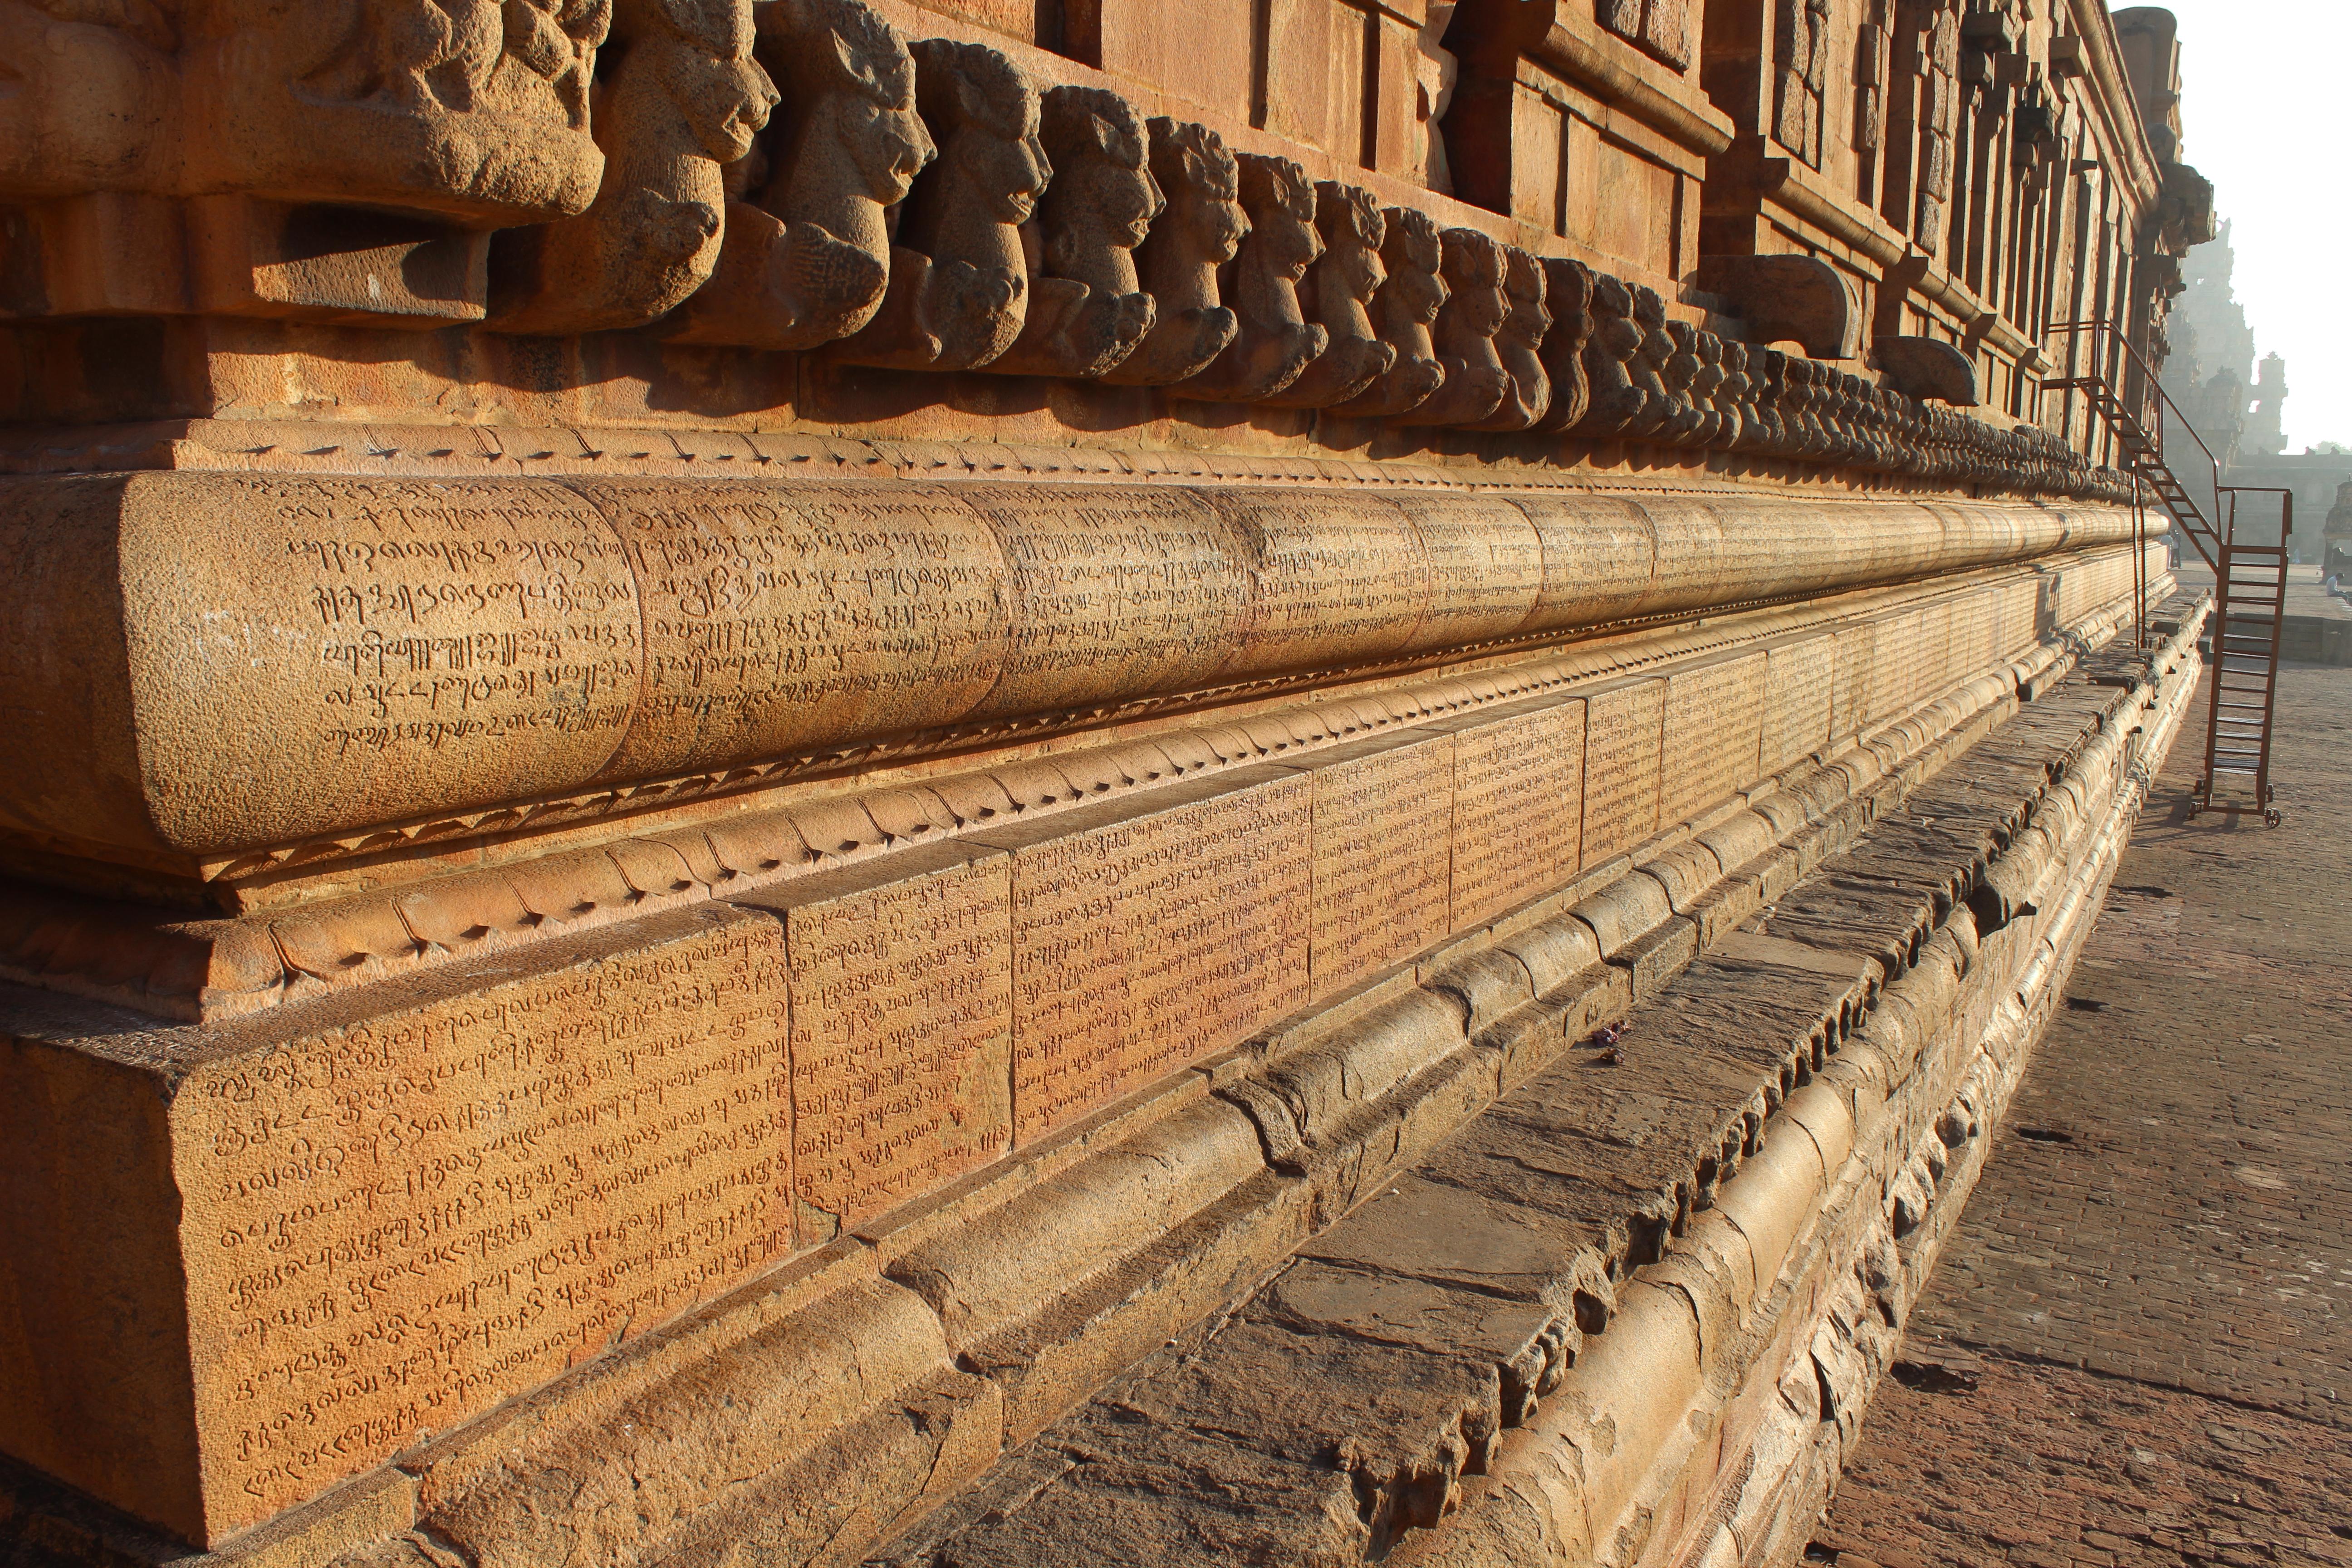 File:Tamil Inscriptions in Thanjavur Brahadeeshwara Temple